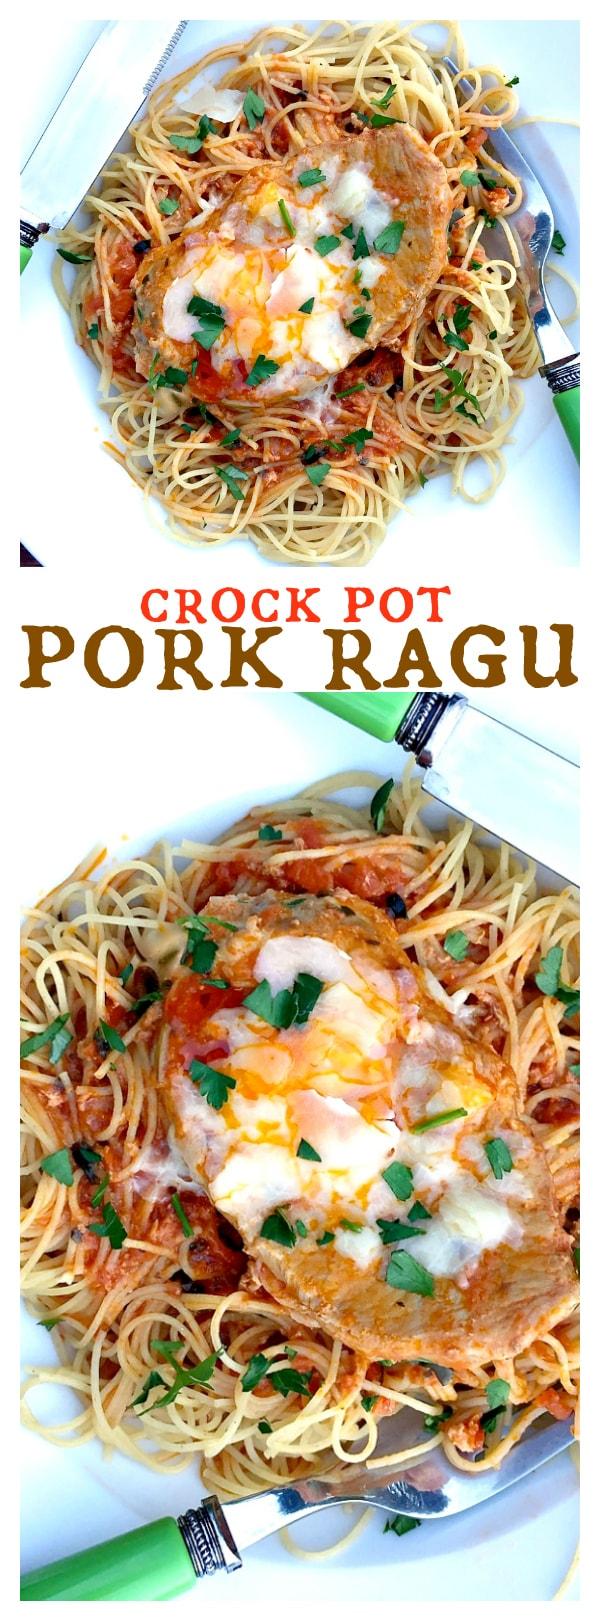 Crock Pot Pork Ragu